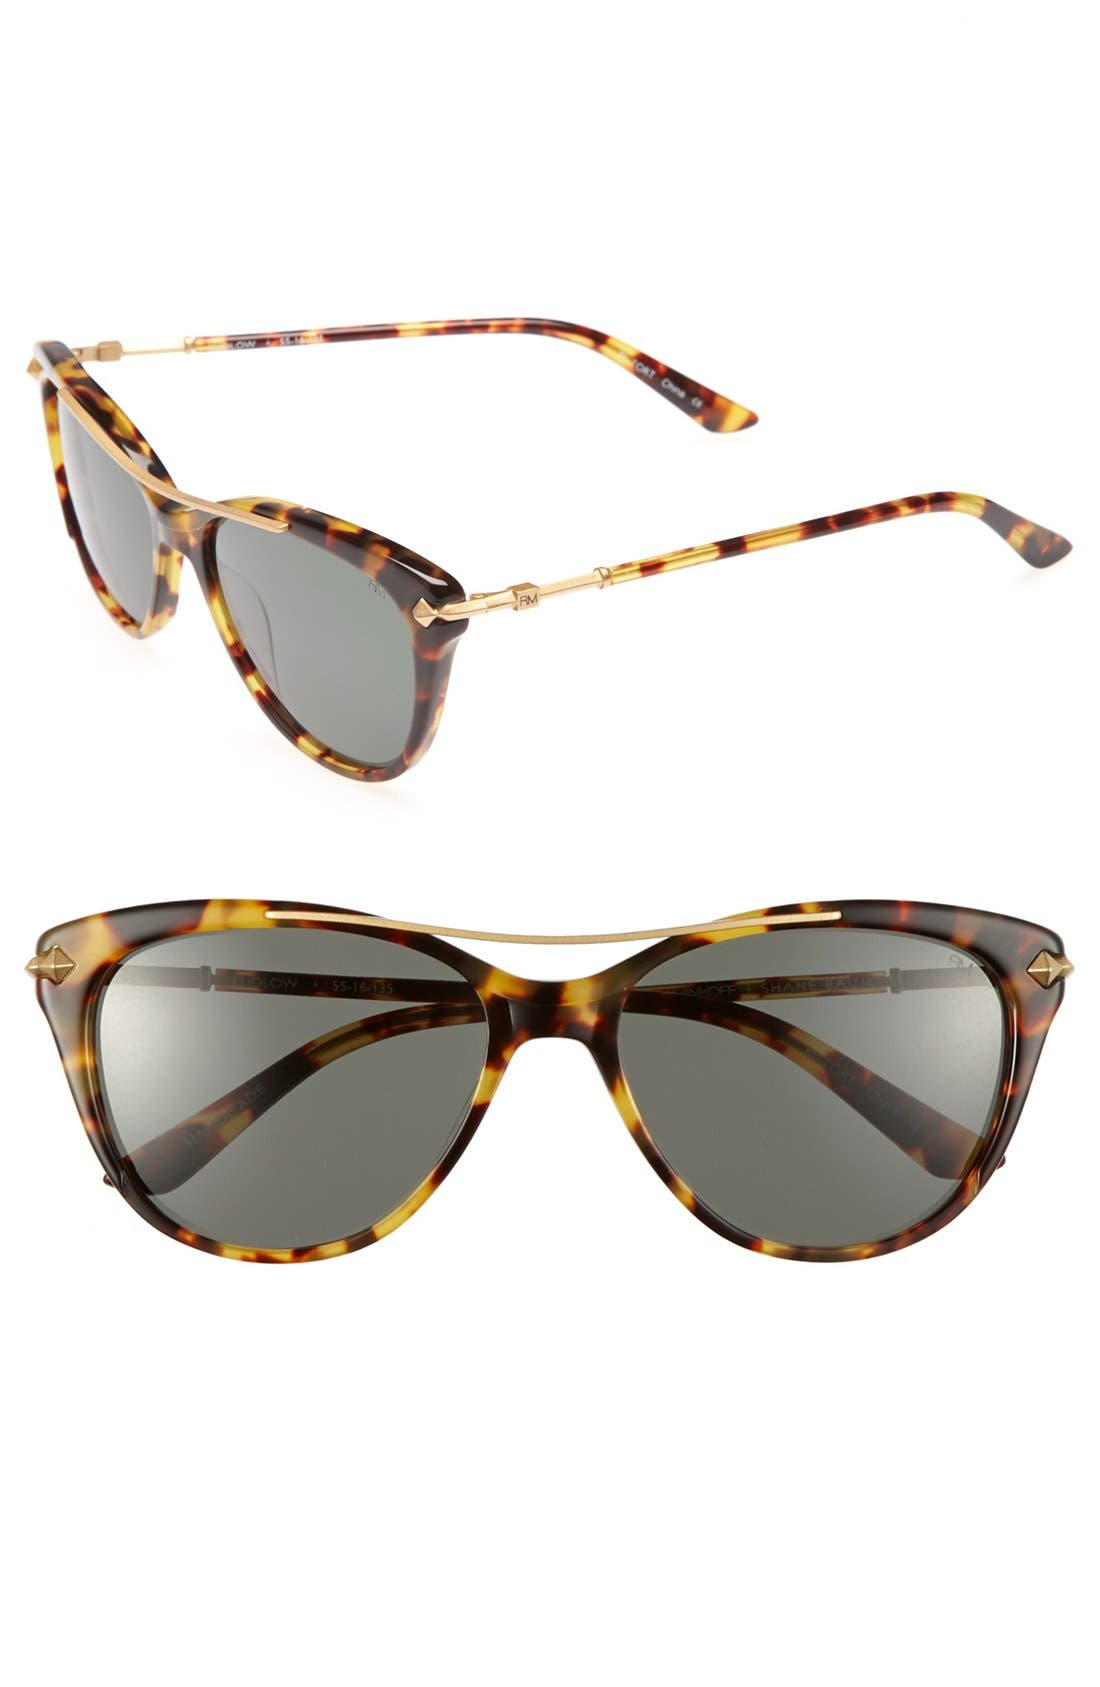 Main Image - Rebecca Minkoff 'Ludlow' 55mm Sunglasses